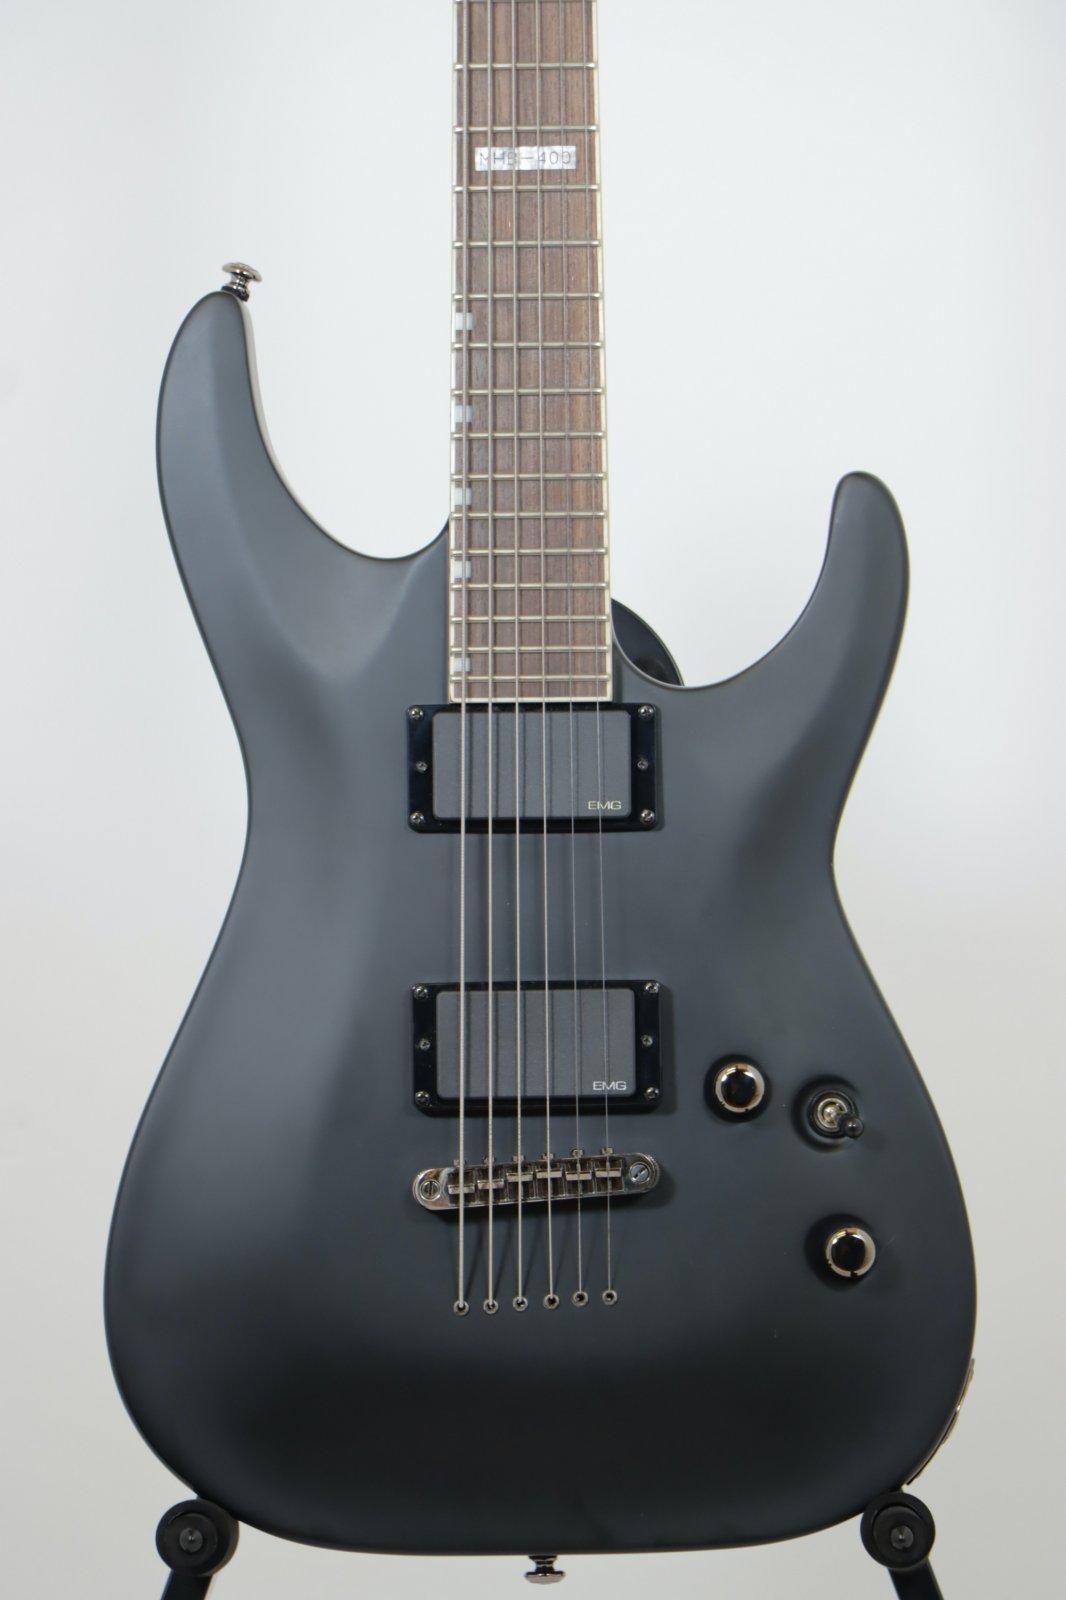 USED ESP LTD Electric Baritone Guitar Model MHB-400 Like New!